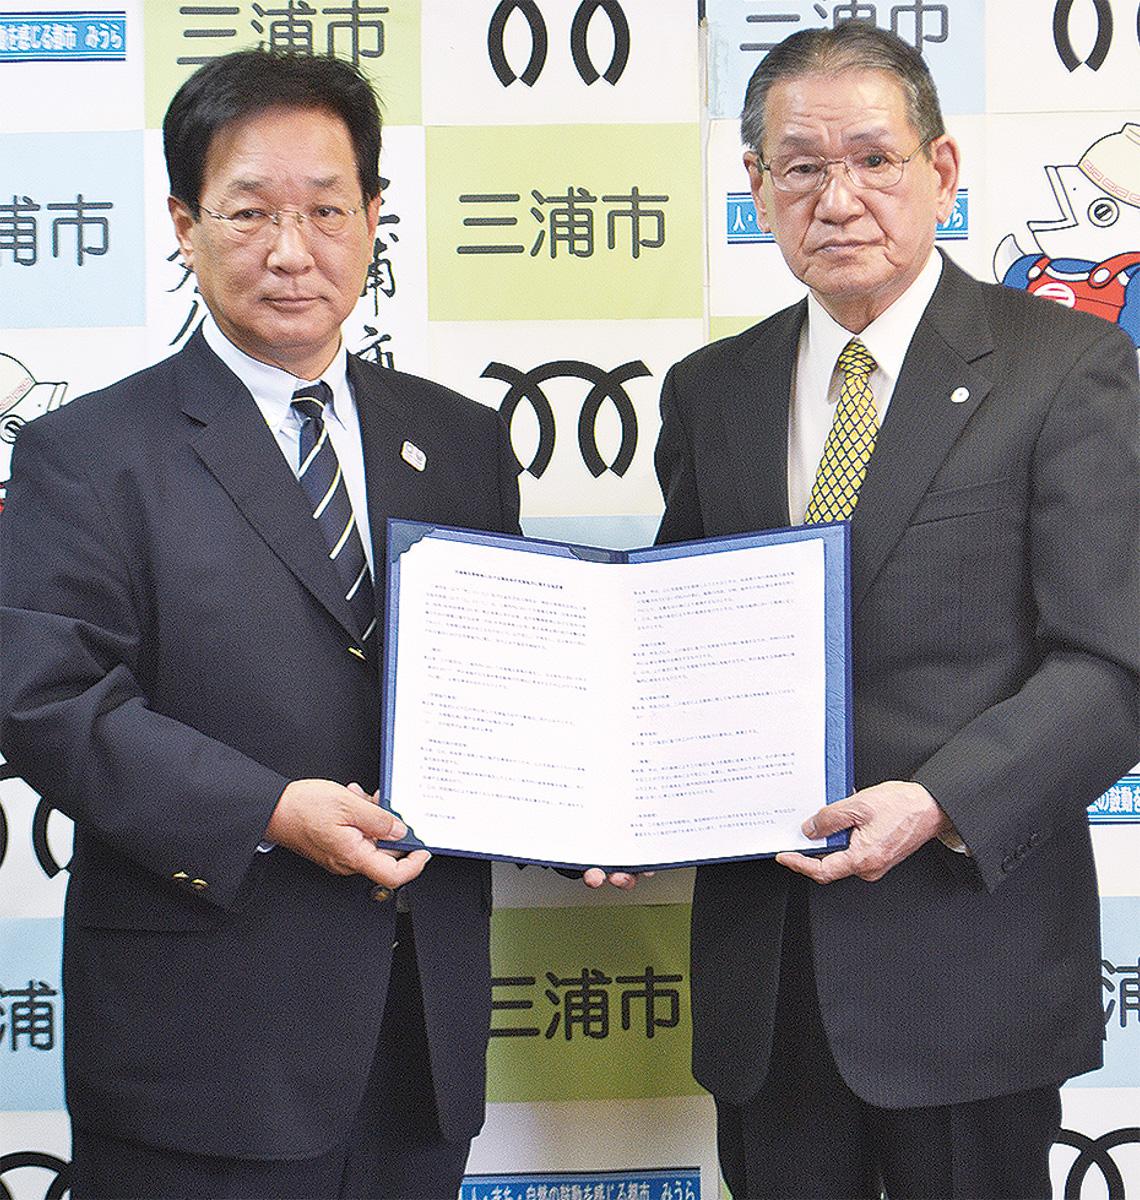 協定締結した隊友会の定本支部長=写真右=と吉田市長